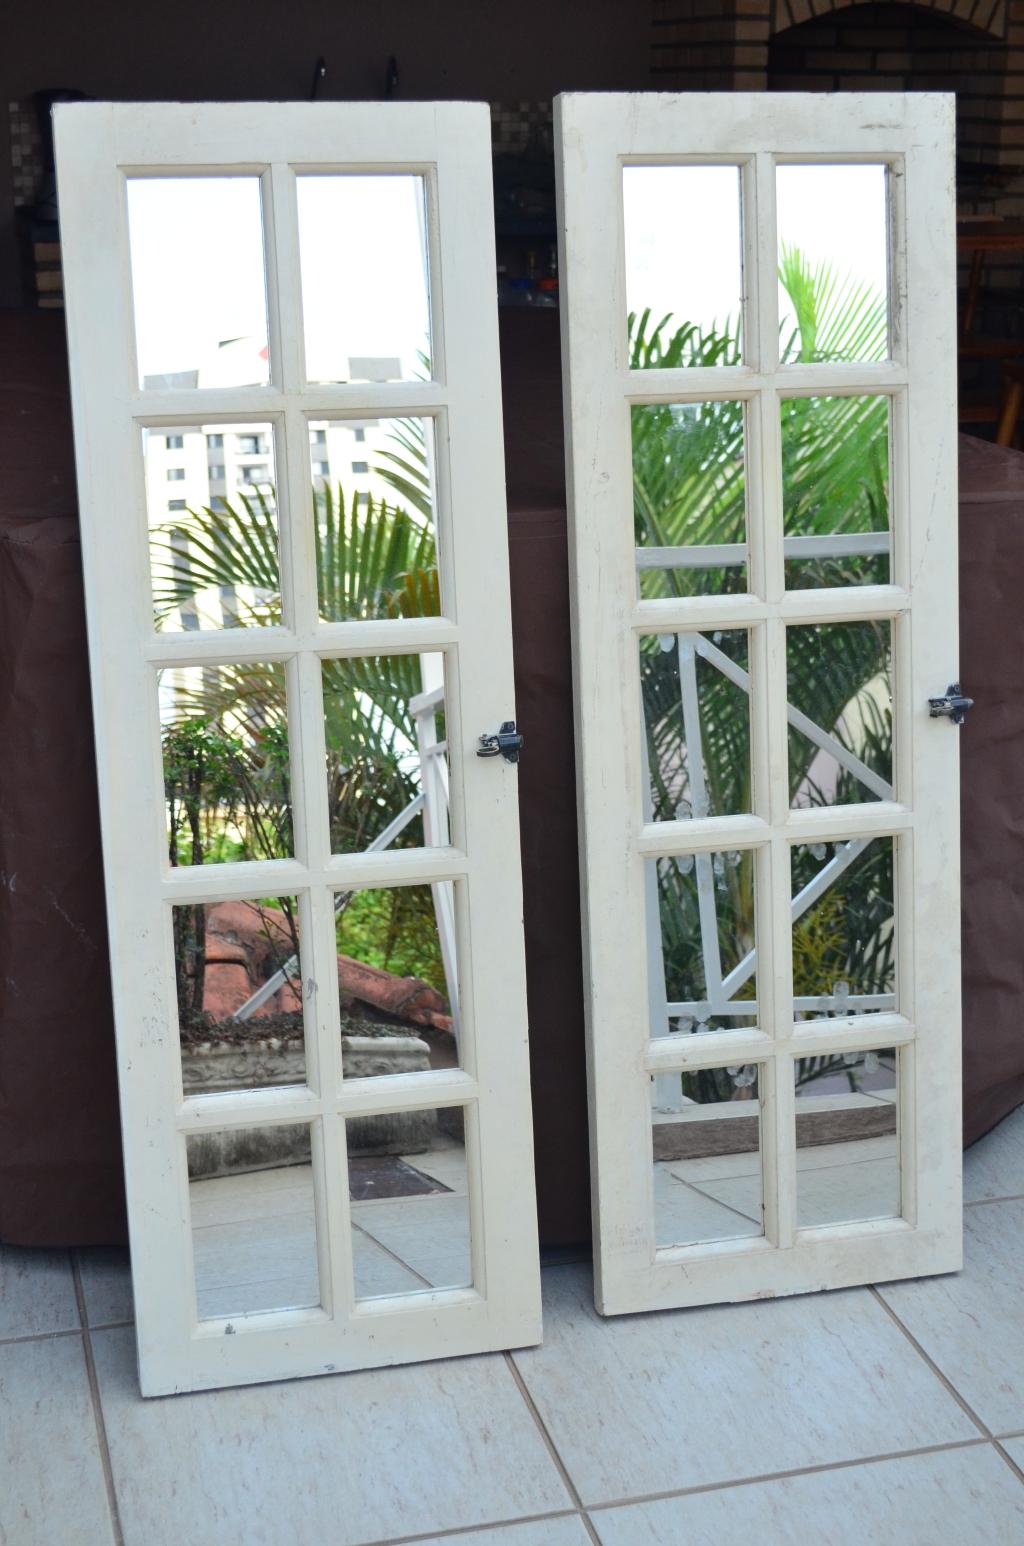 Extremamente Espelhos janelas | Sisleine Arquitetura UT43